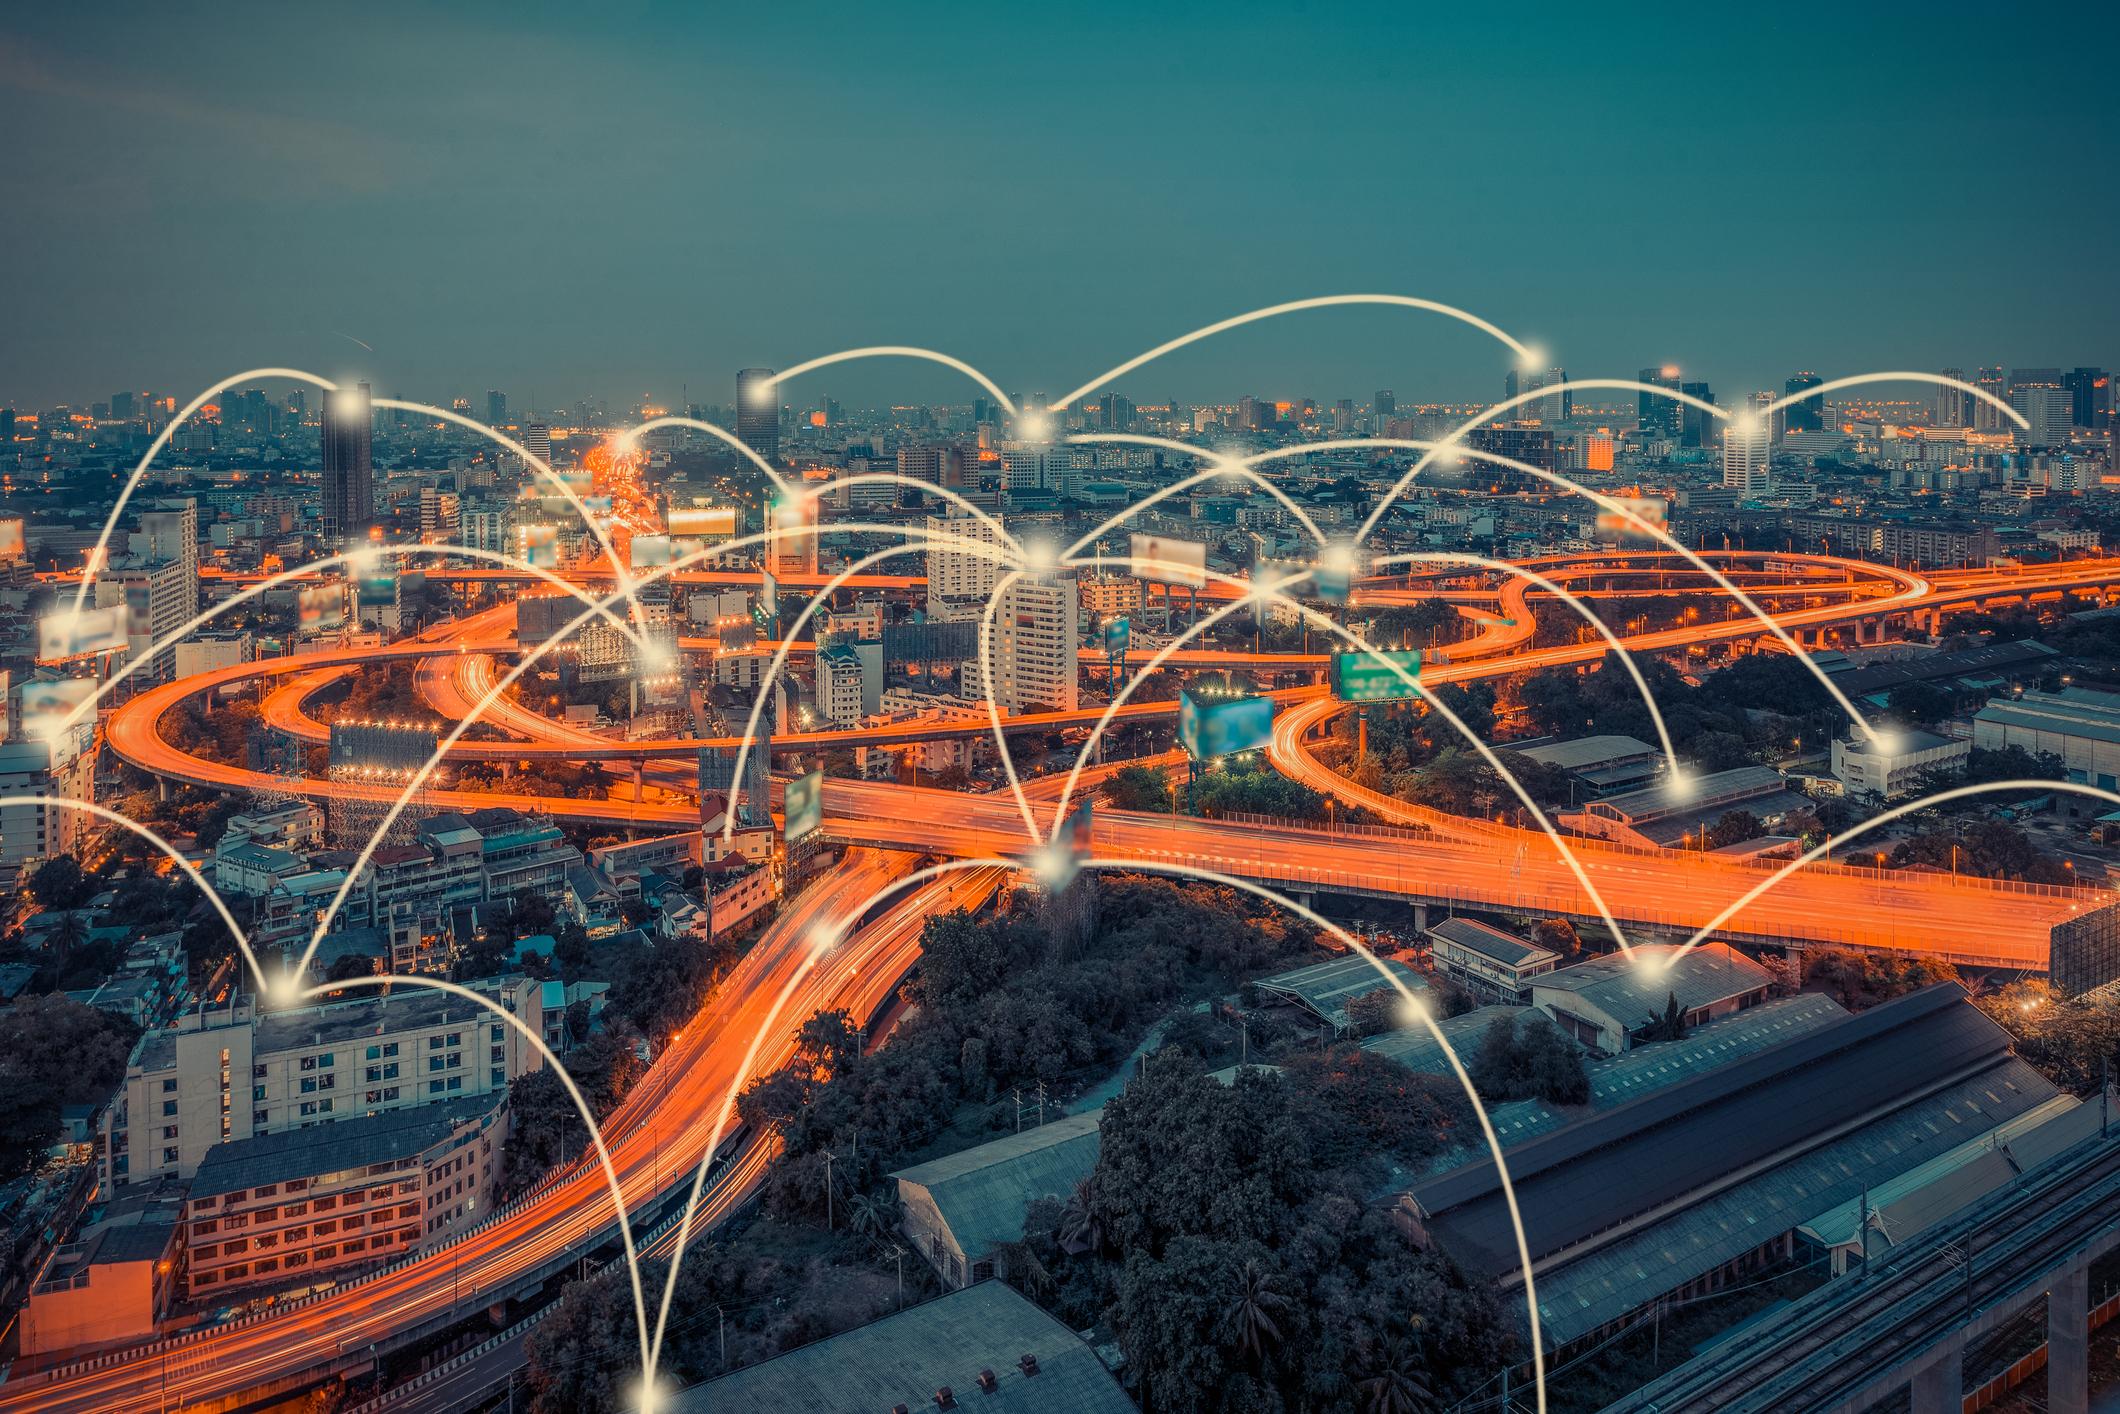 Cityscape illustrating connectivity